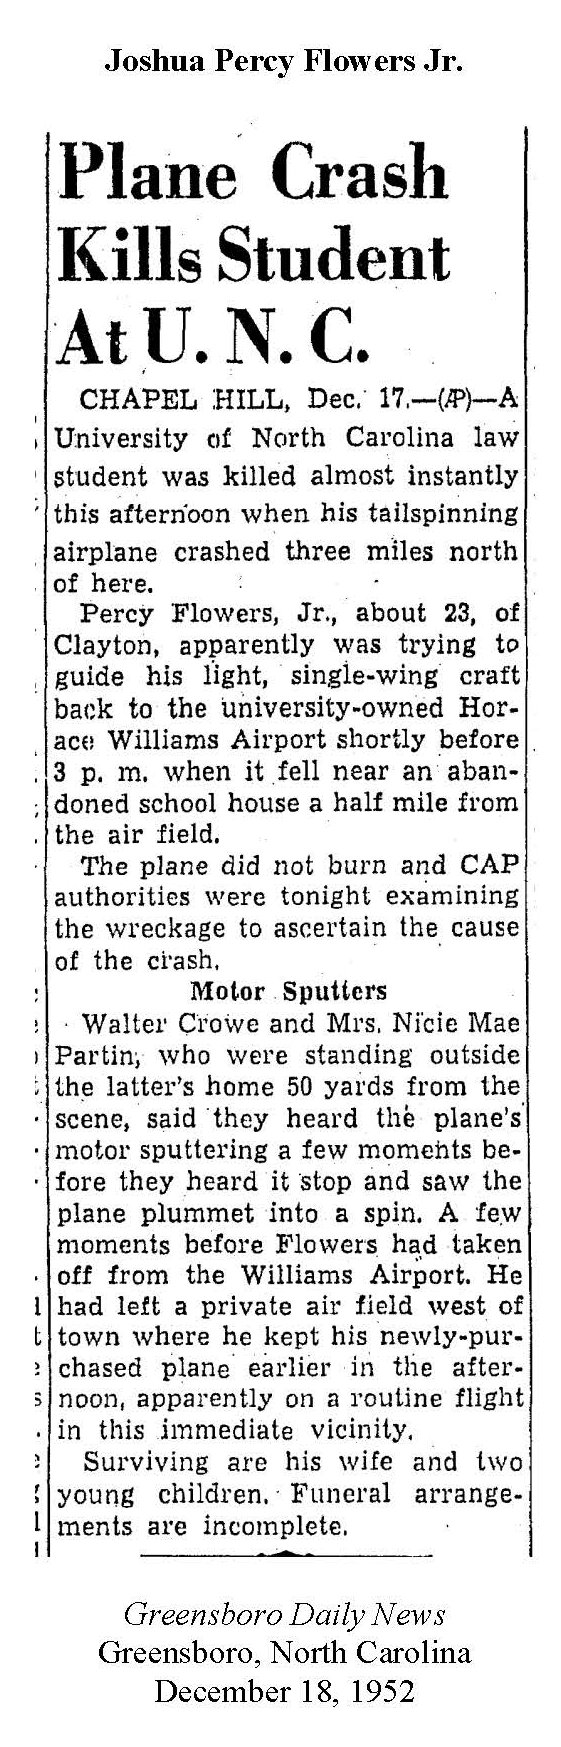 Percy Flowers